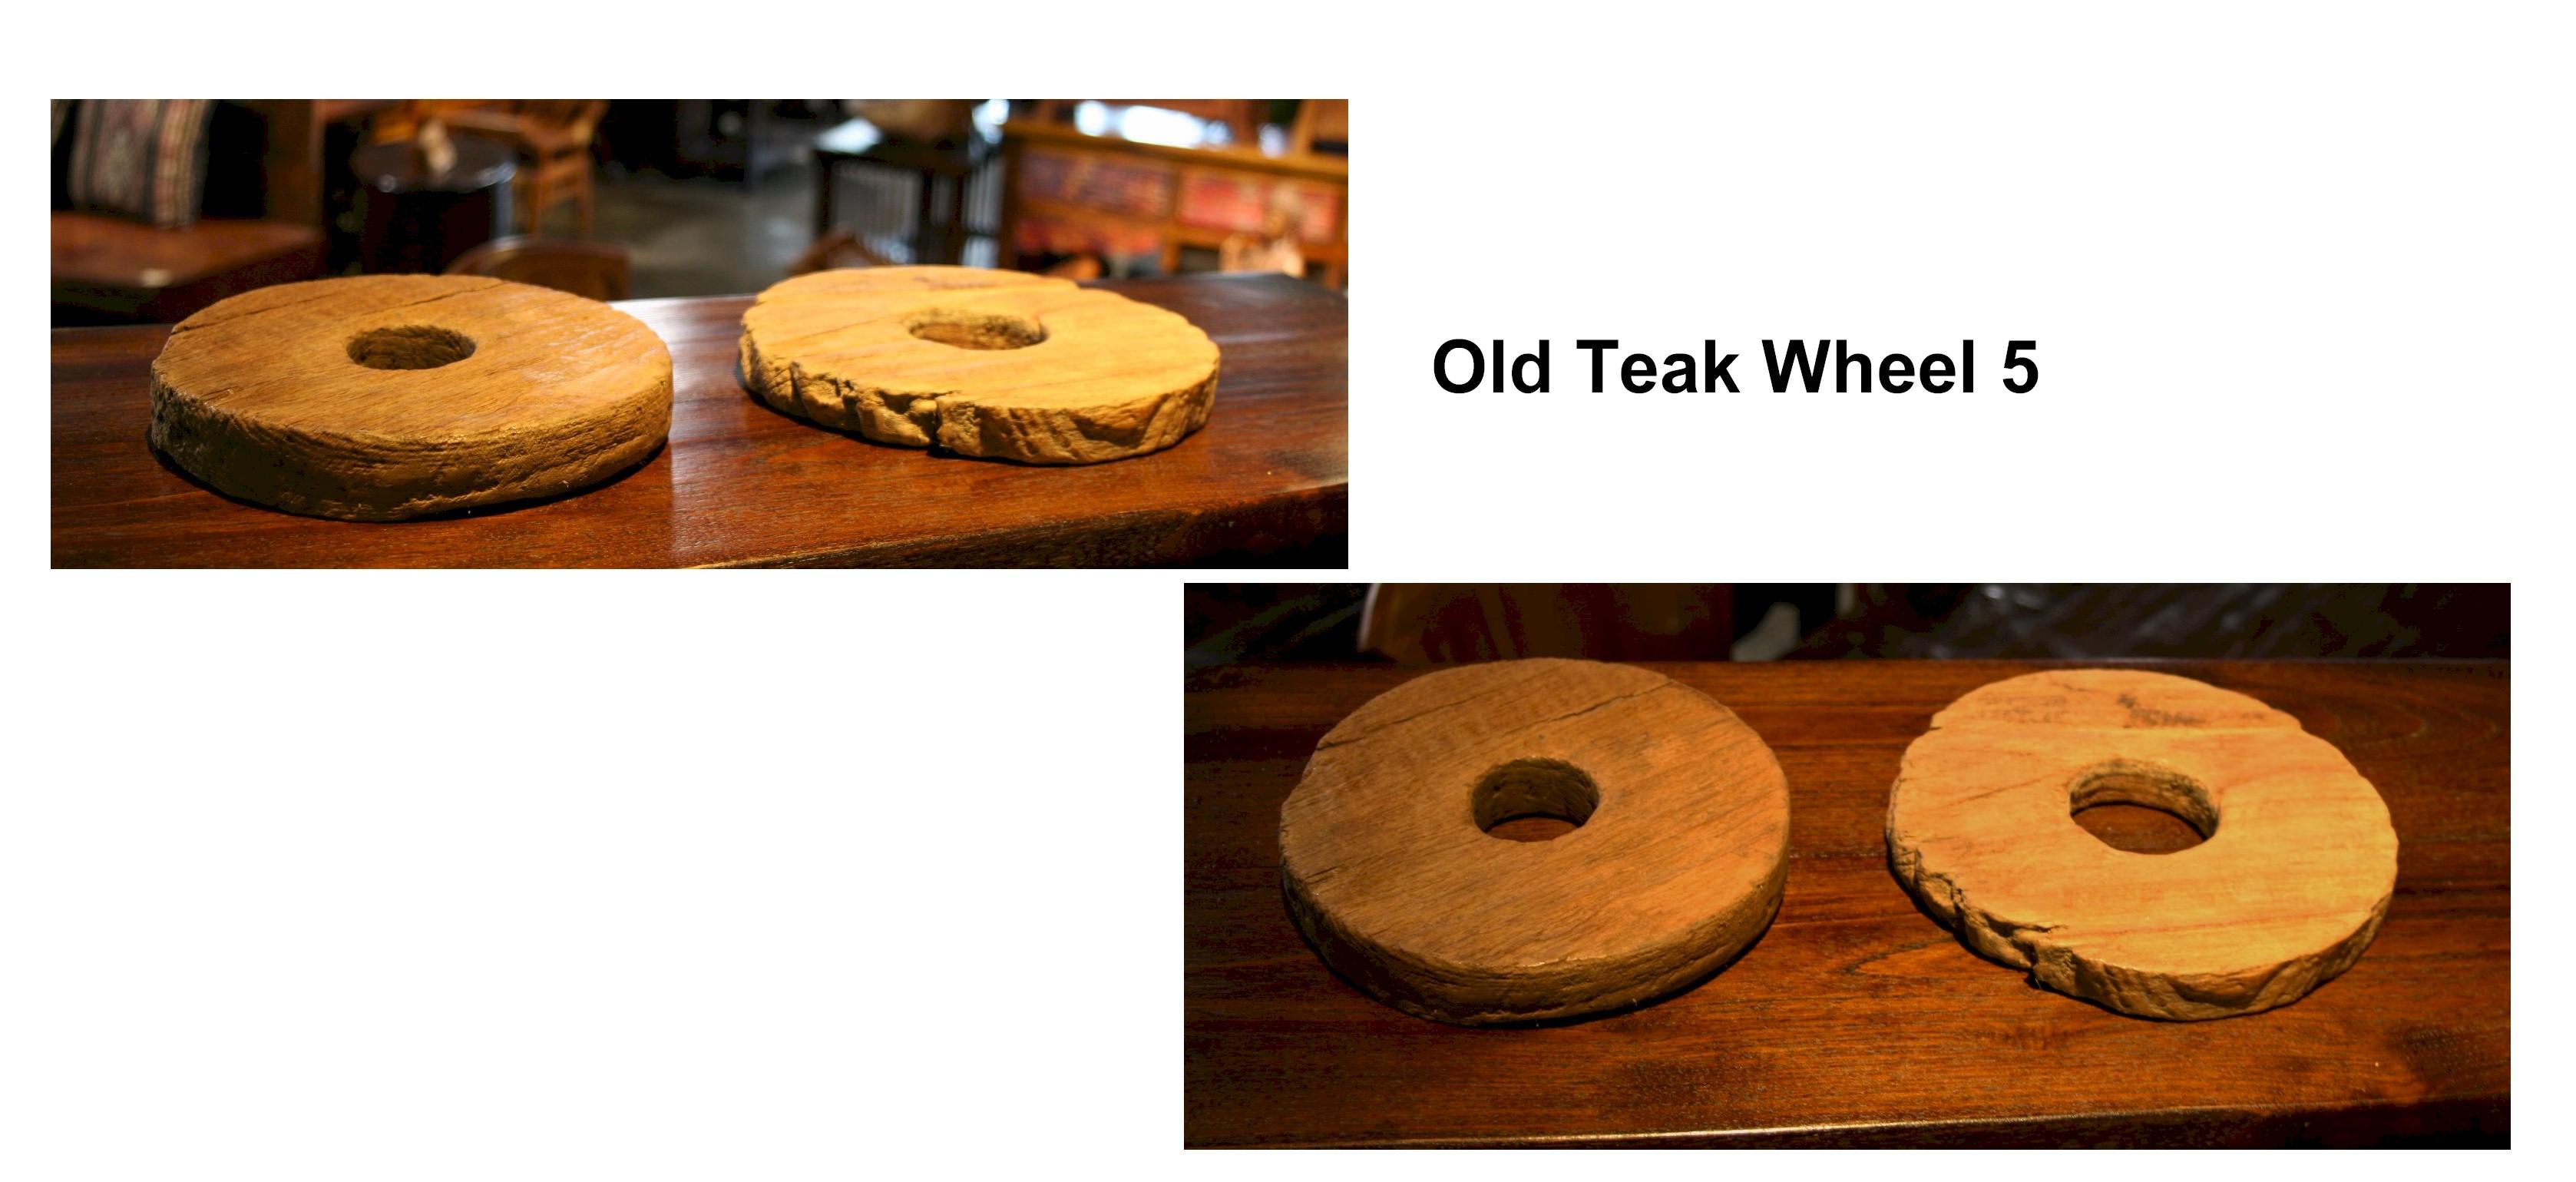 Old Teak Wheel 5